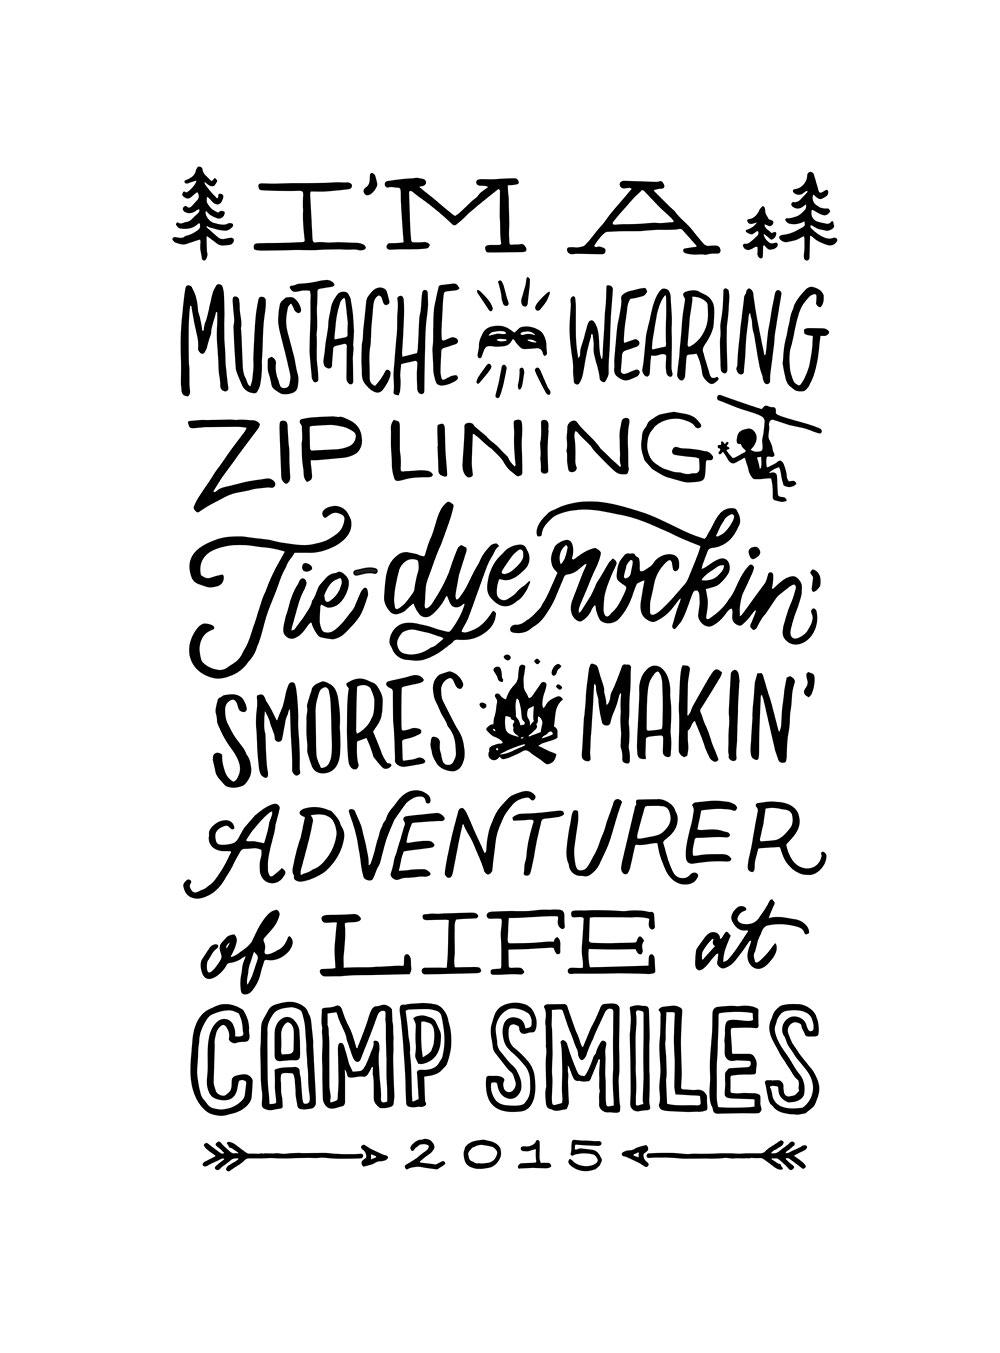 cake-camp-smiles.jpg